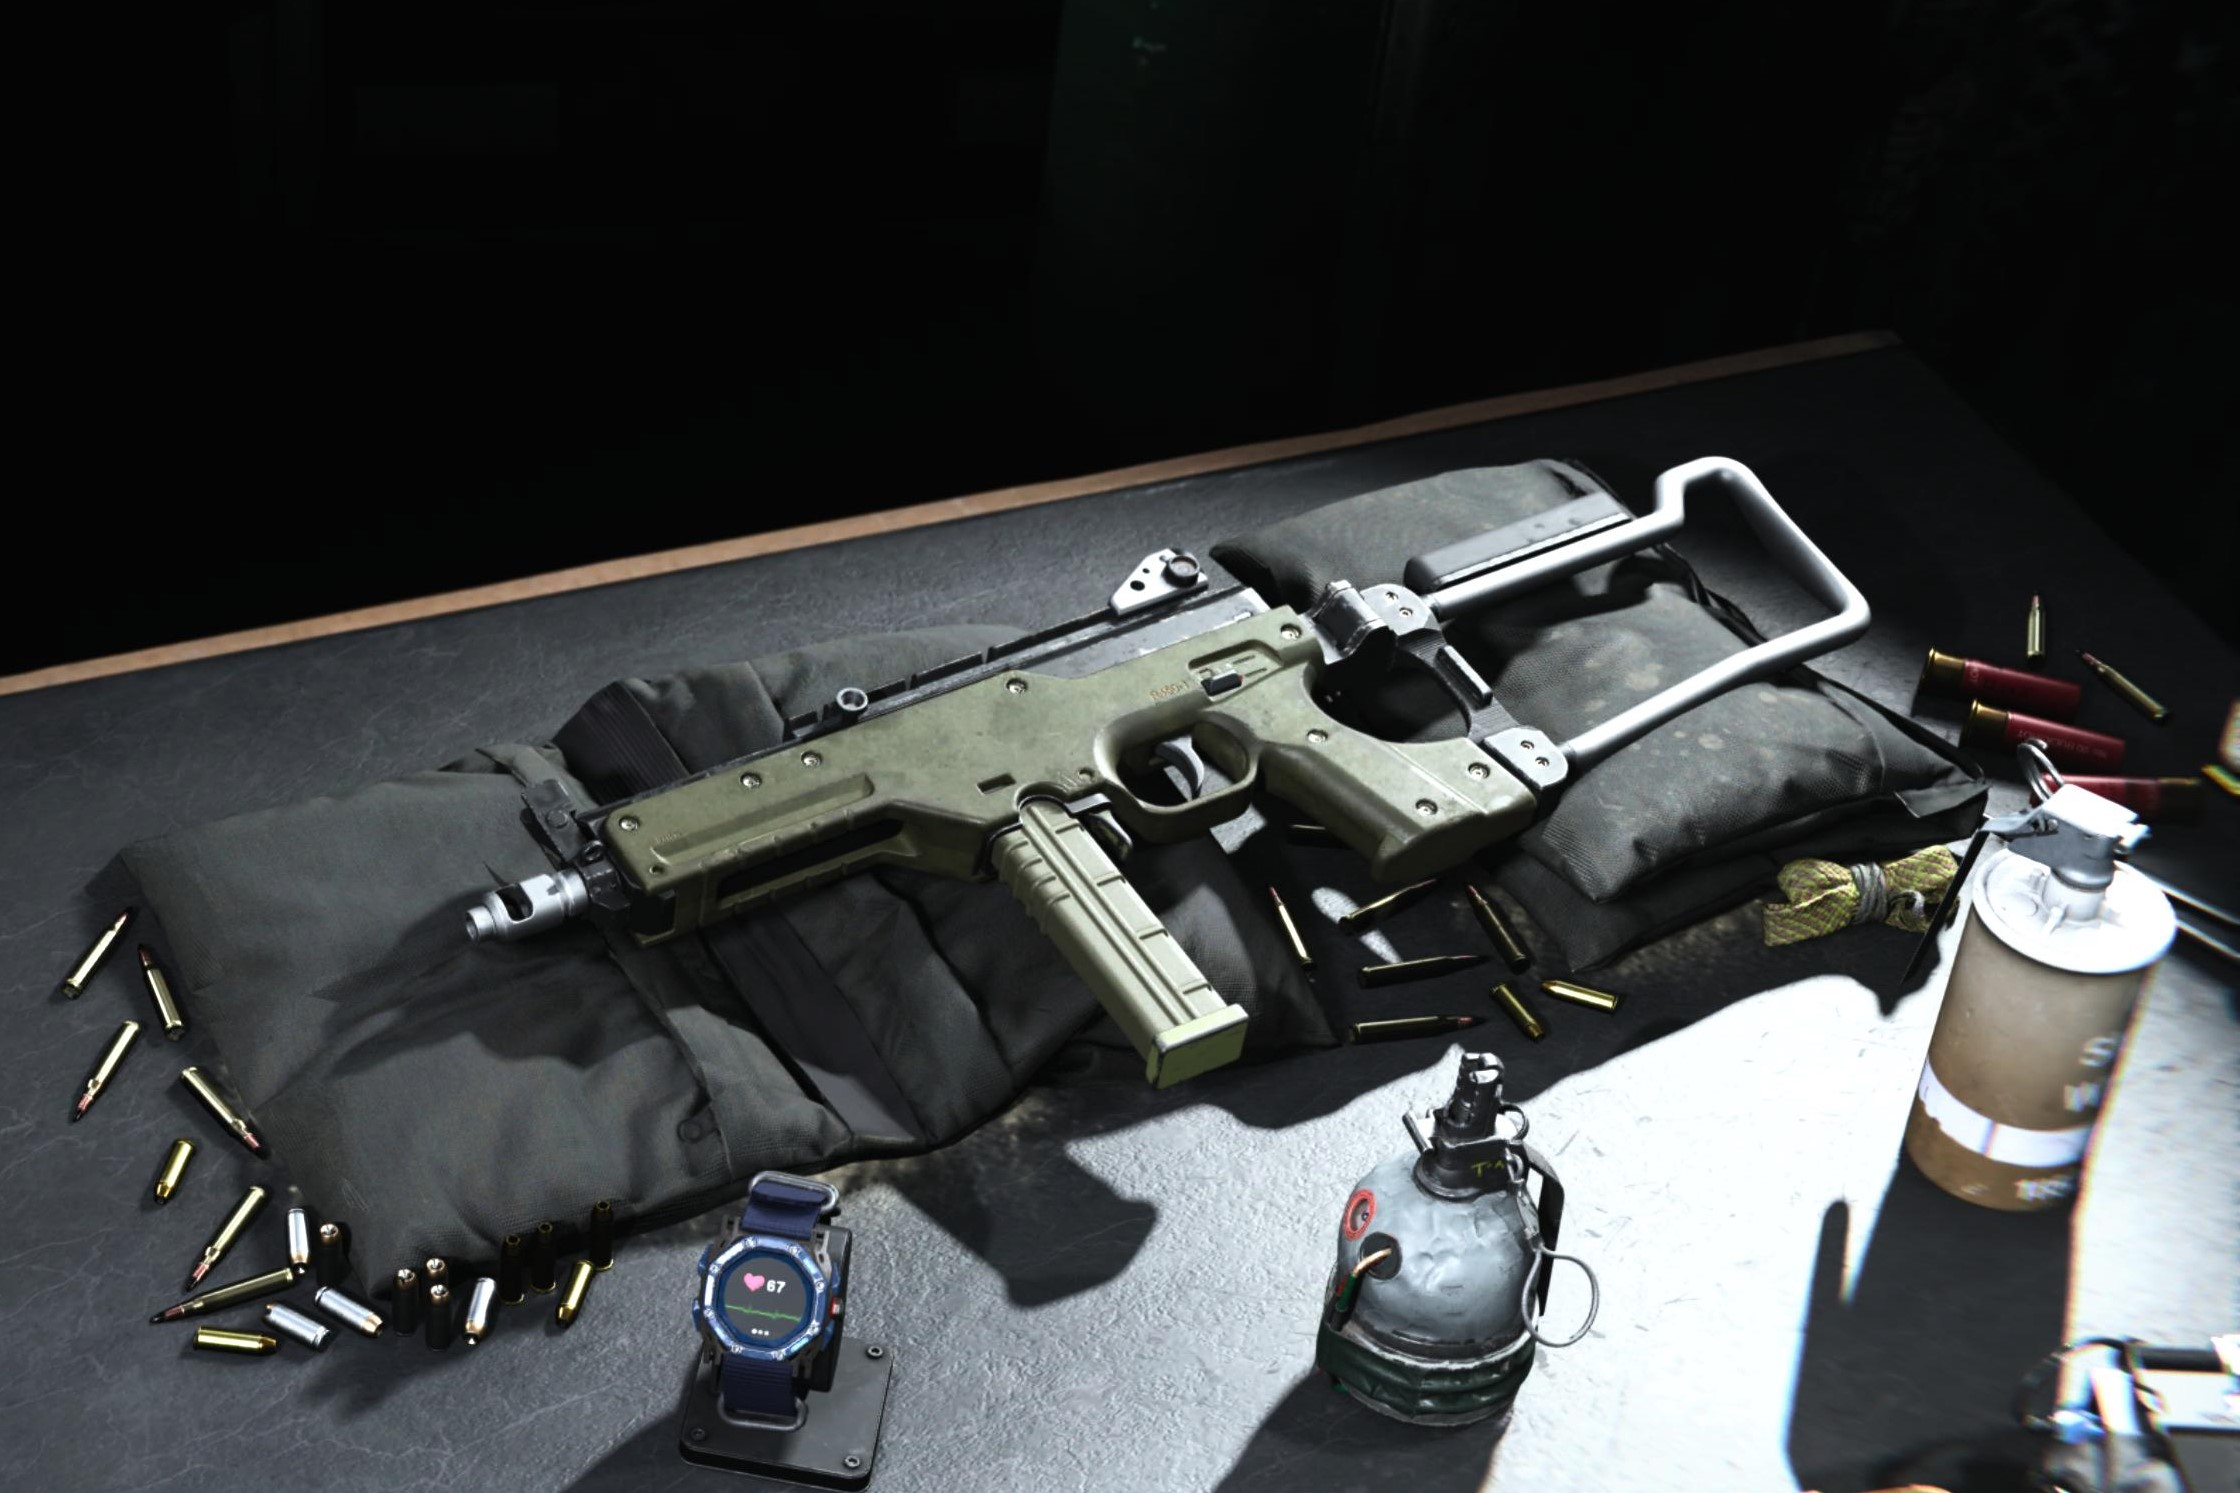 Warzone best LC10 loadout